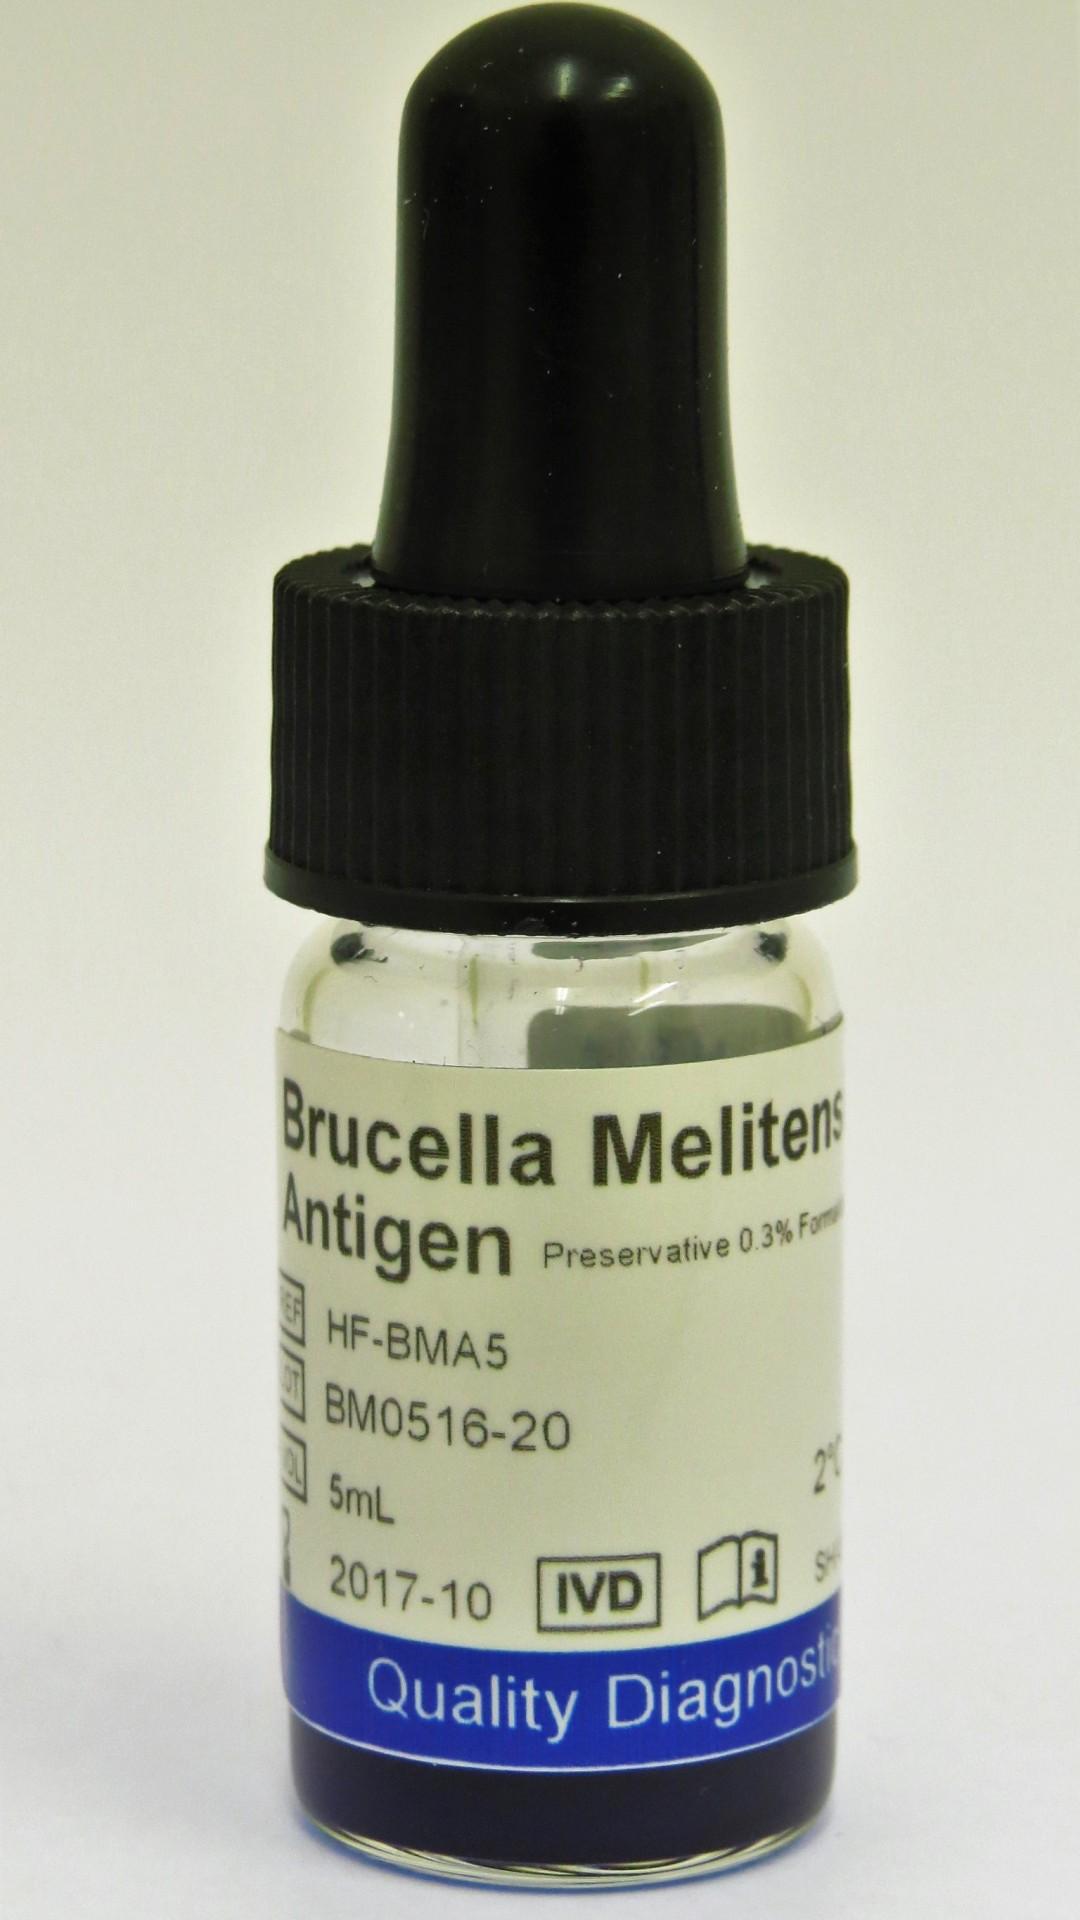 Brucella Melitenes Febrile Antigen